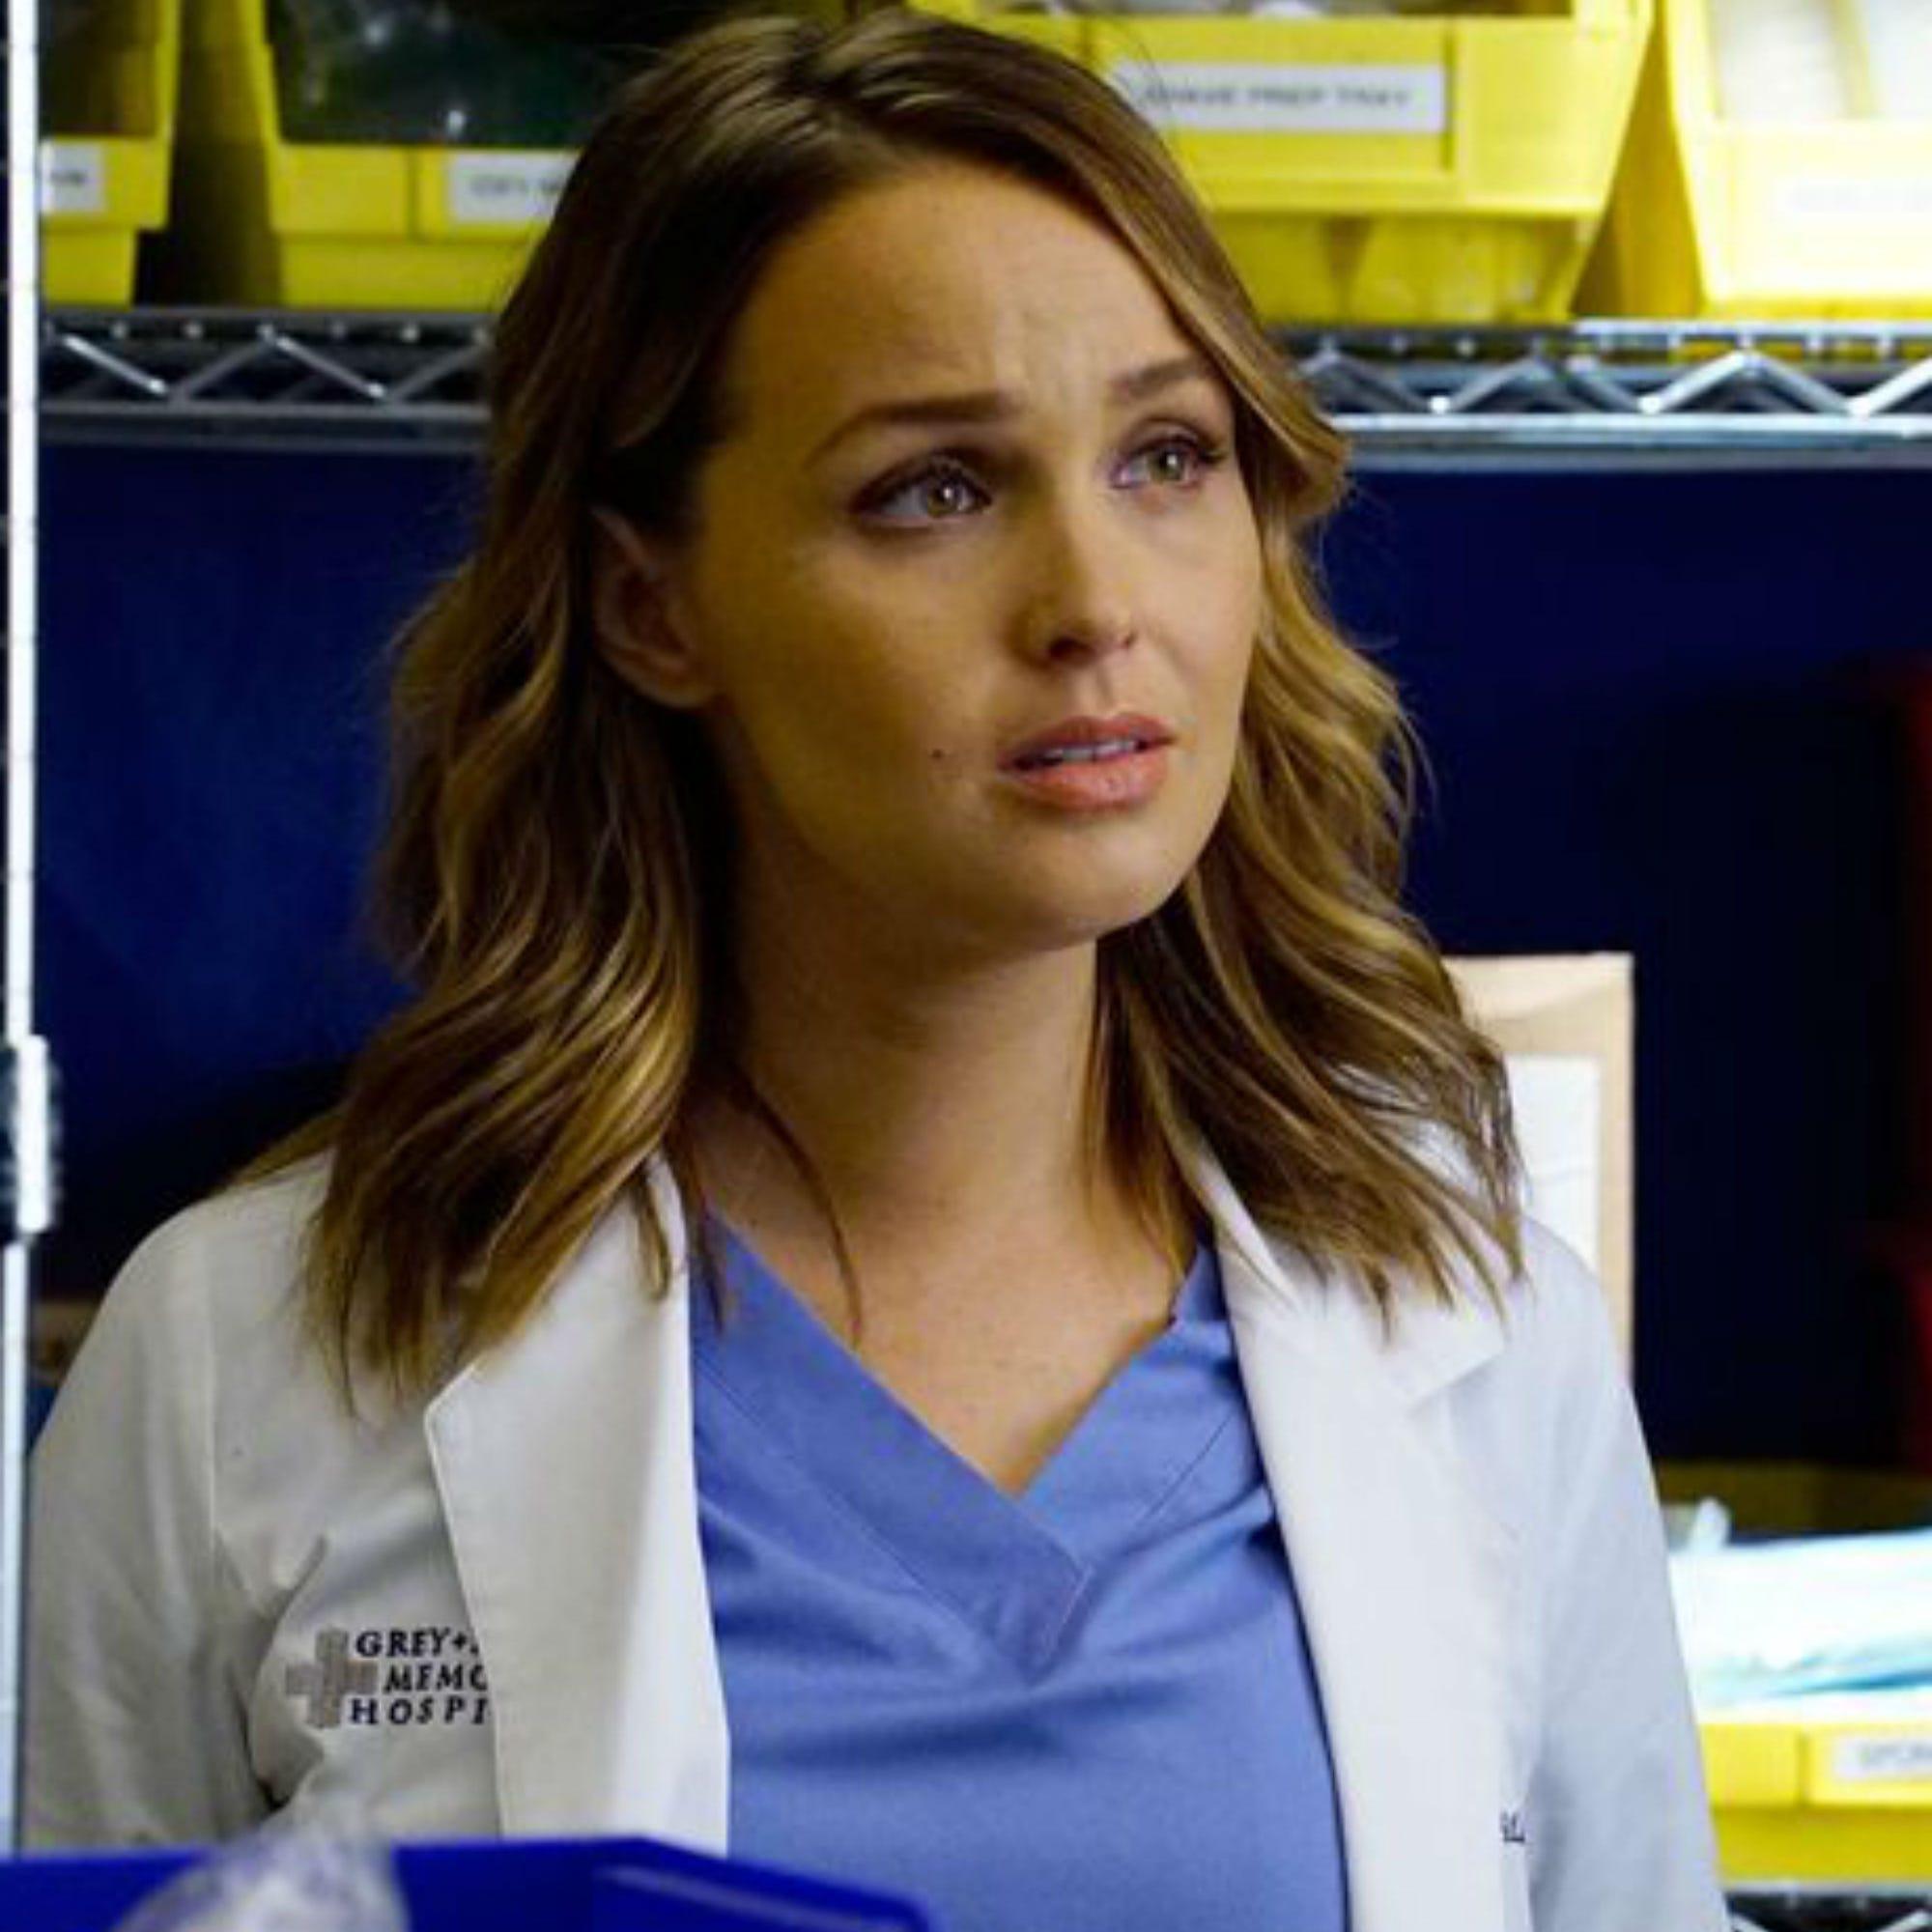 Greys Anatomy Season 13 Episode 9 Recap